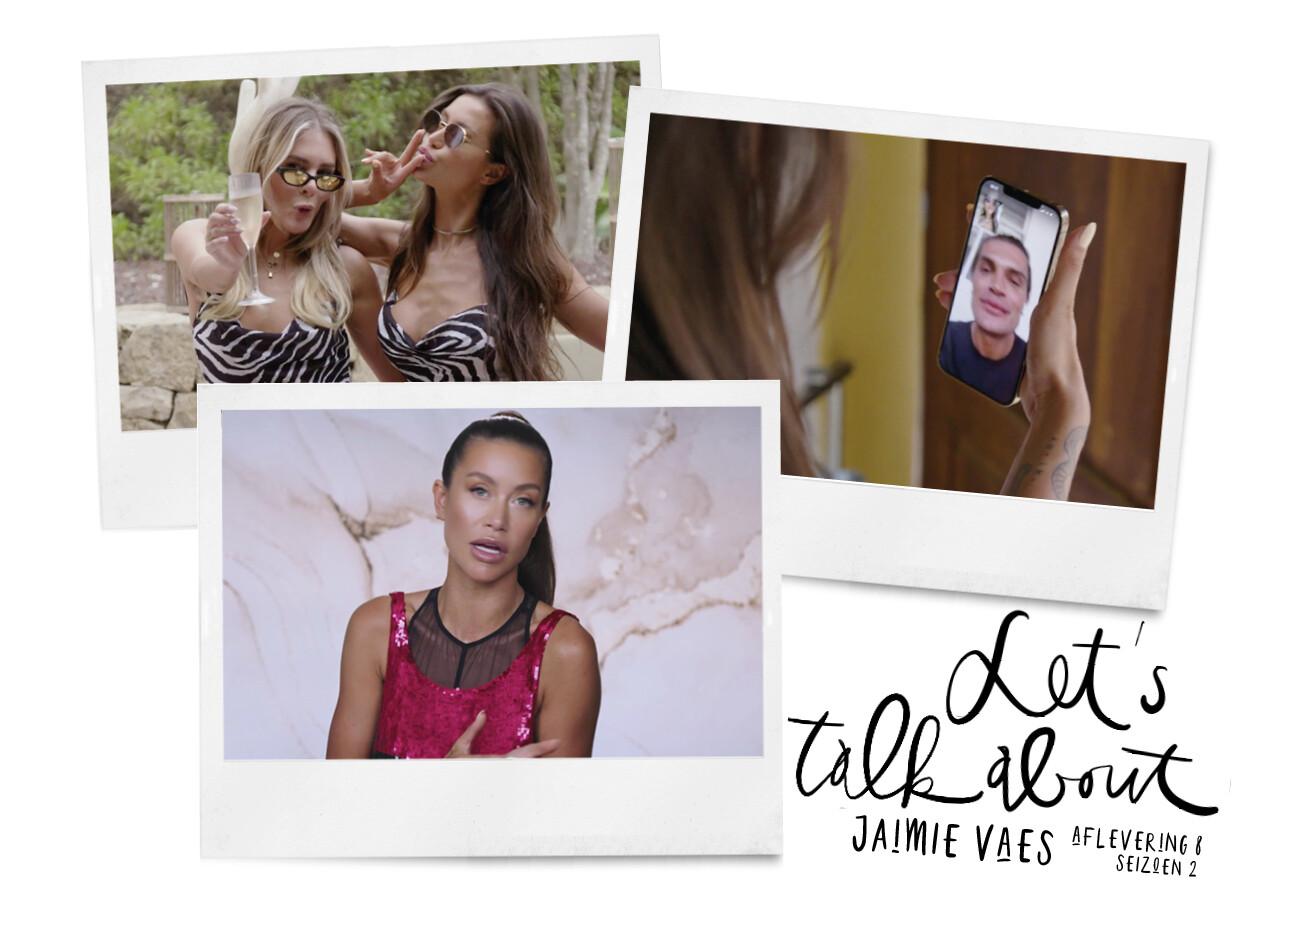 Jaimie in the vaes lane life